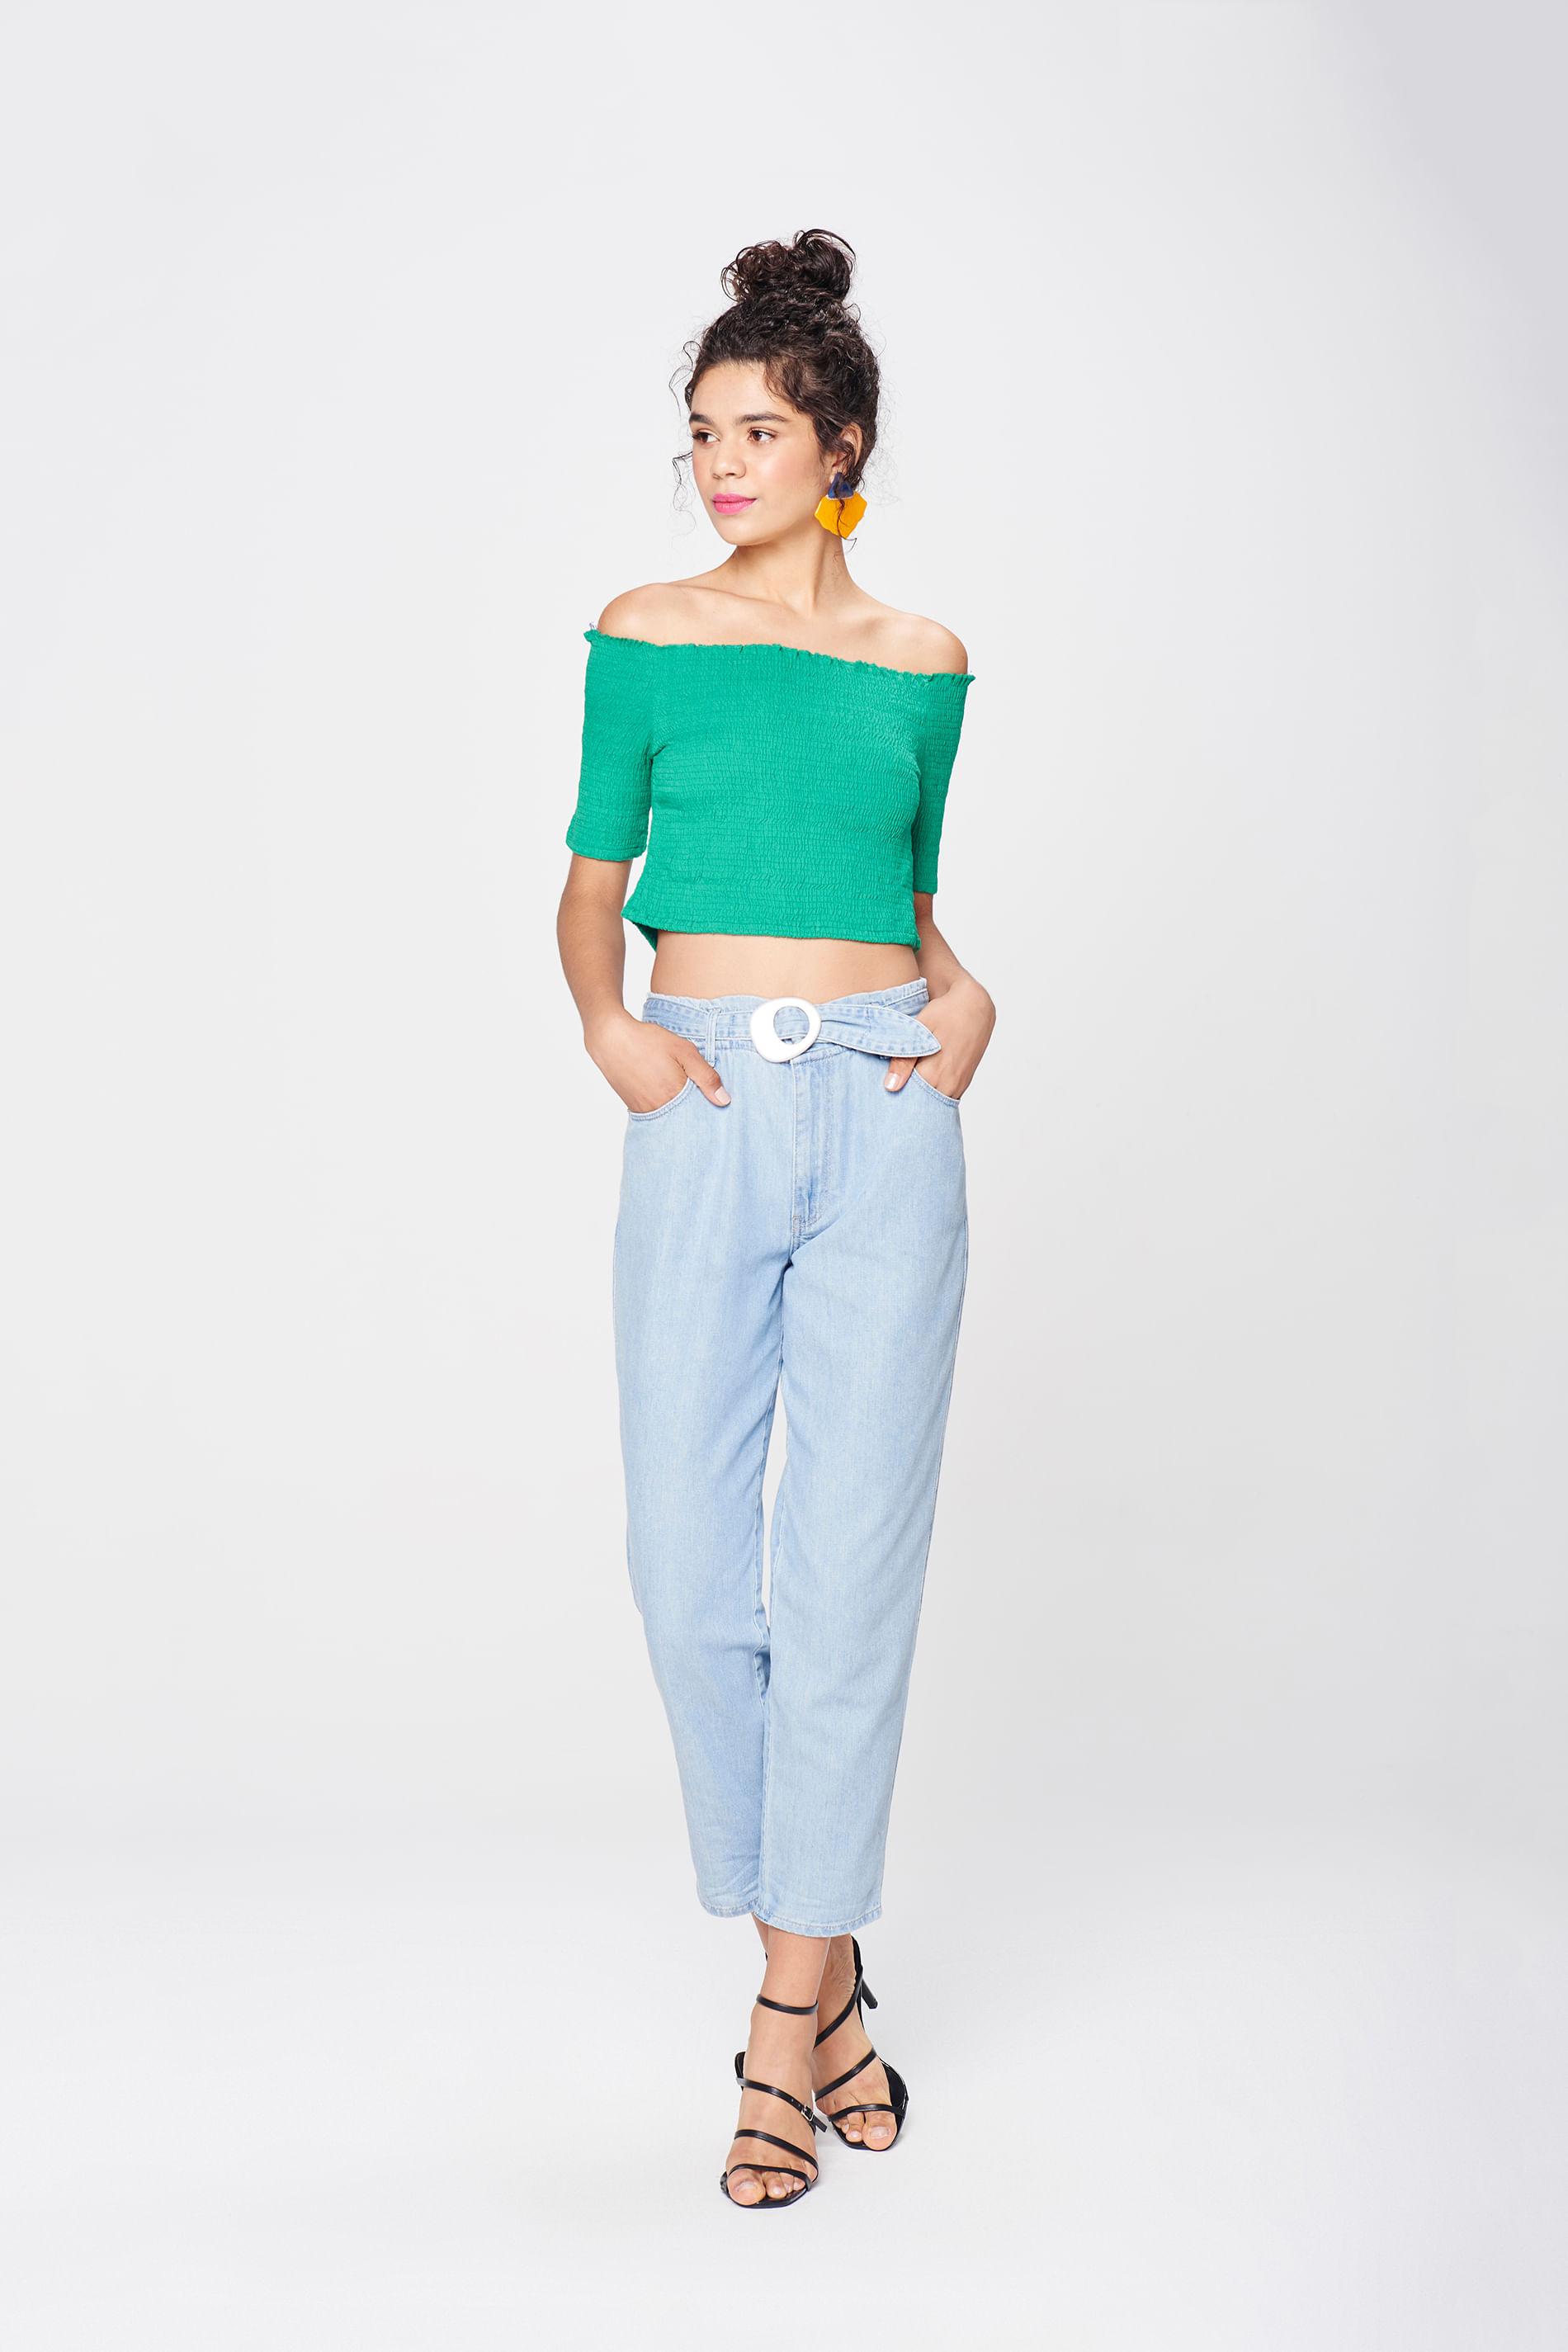 770242e38f Calça Jeans Clochard Cropped Feminina - Damyller